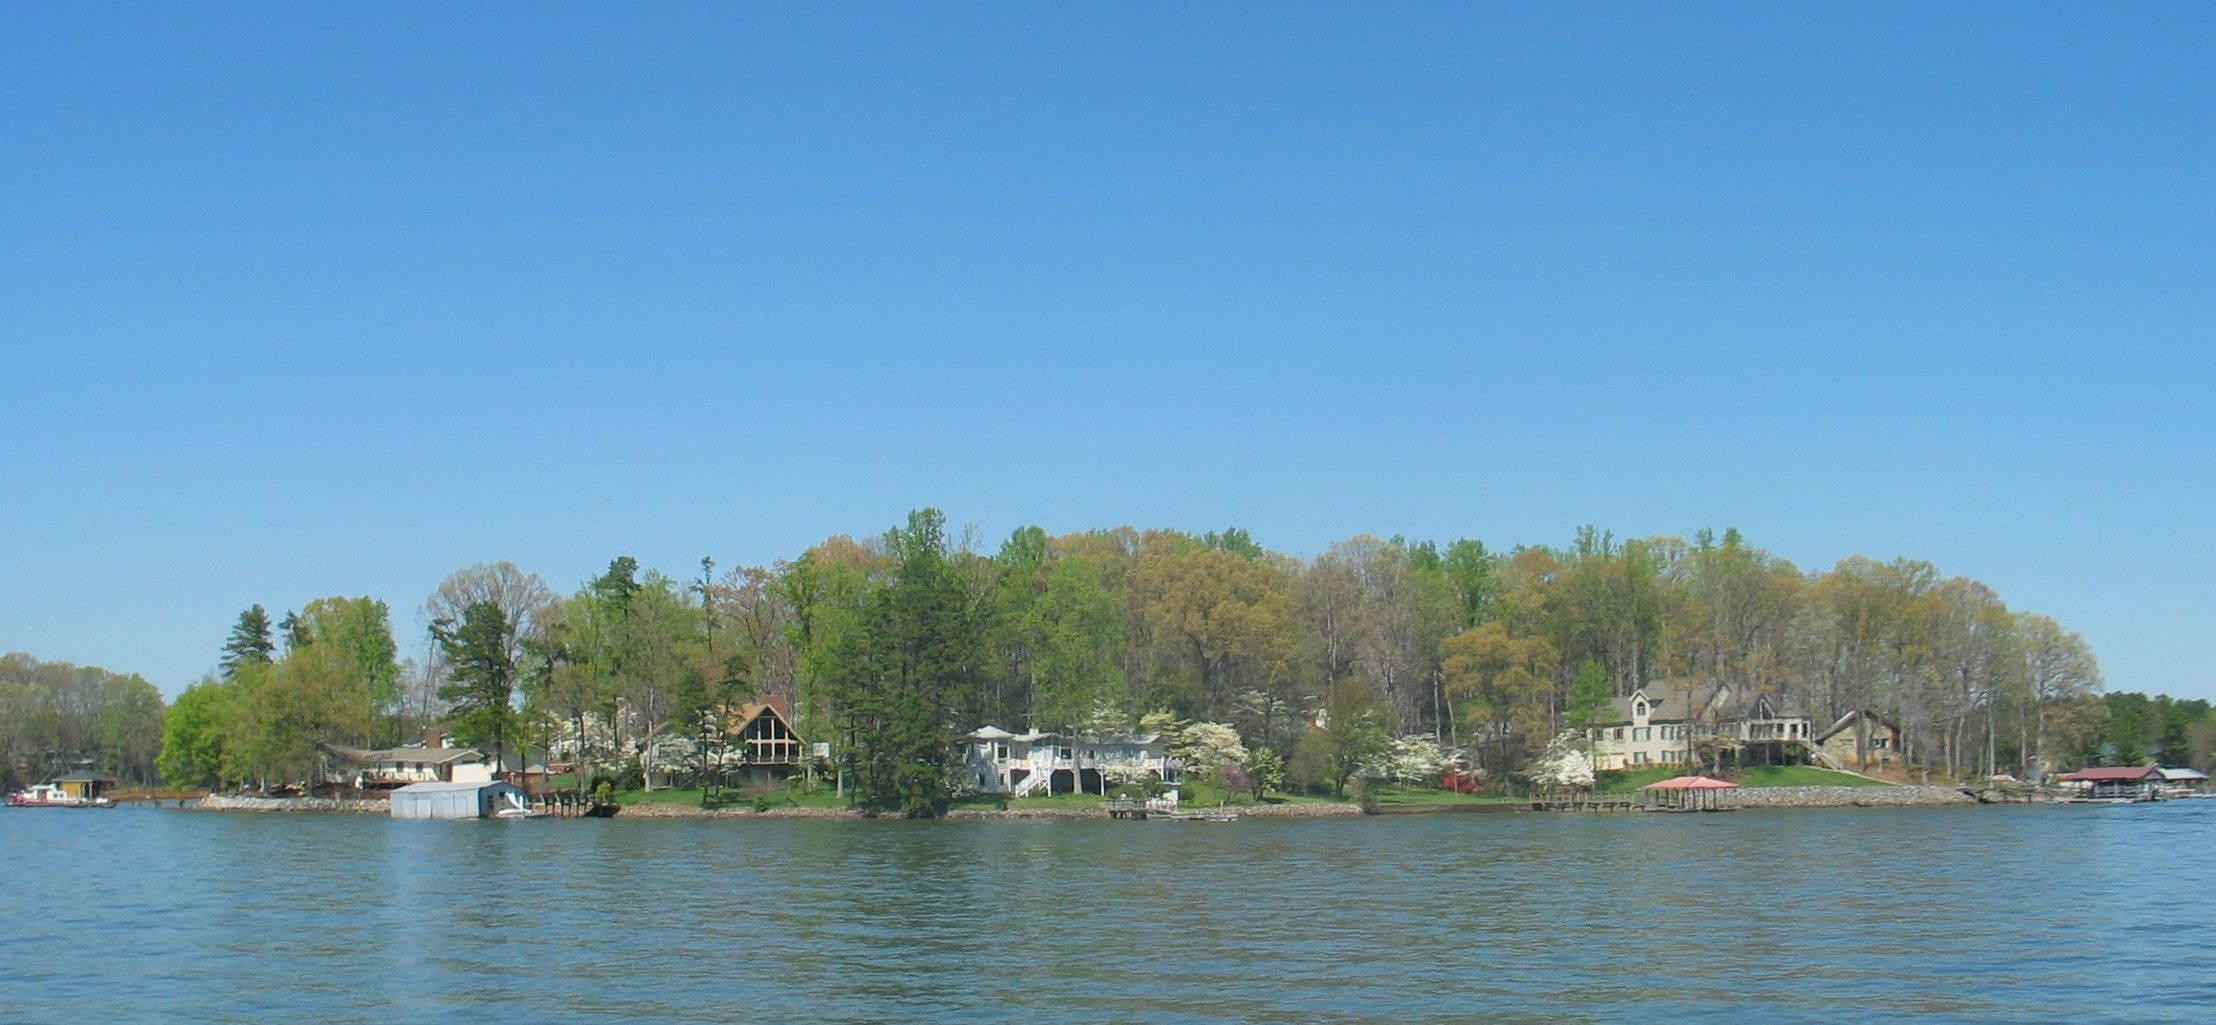 Lake Norman Kayaking Whenever I Wanted